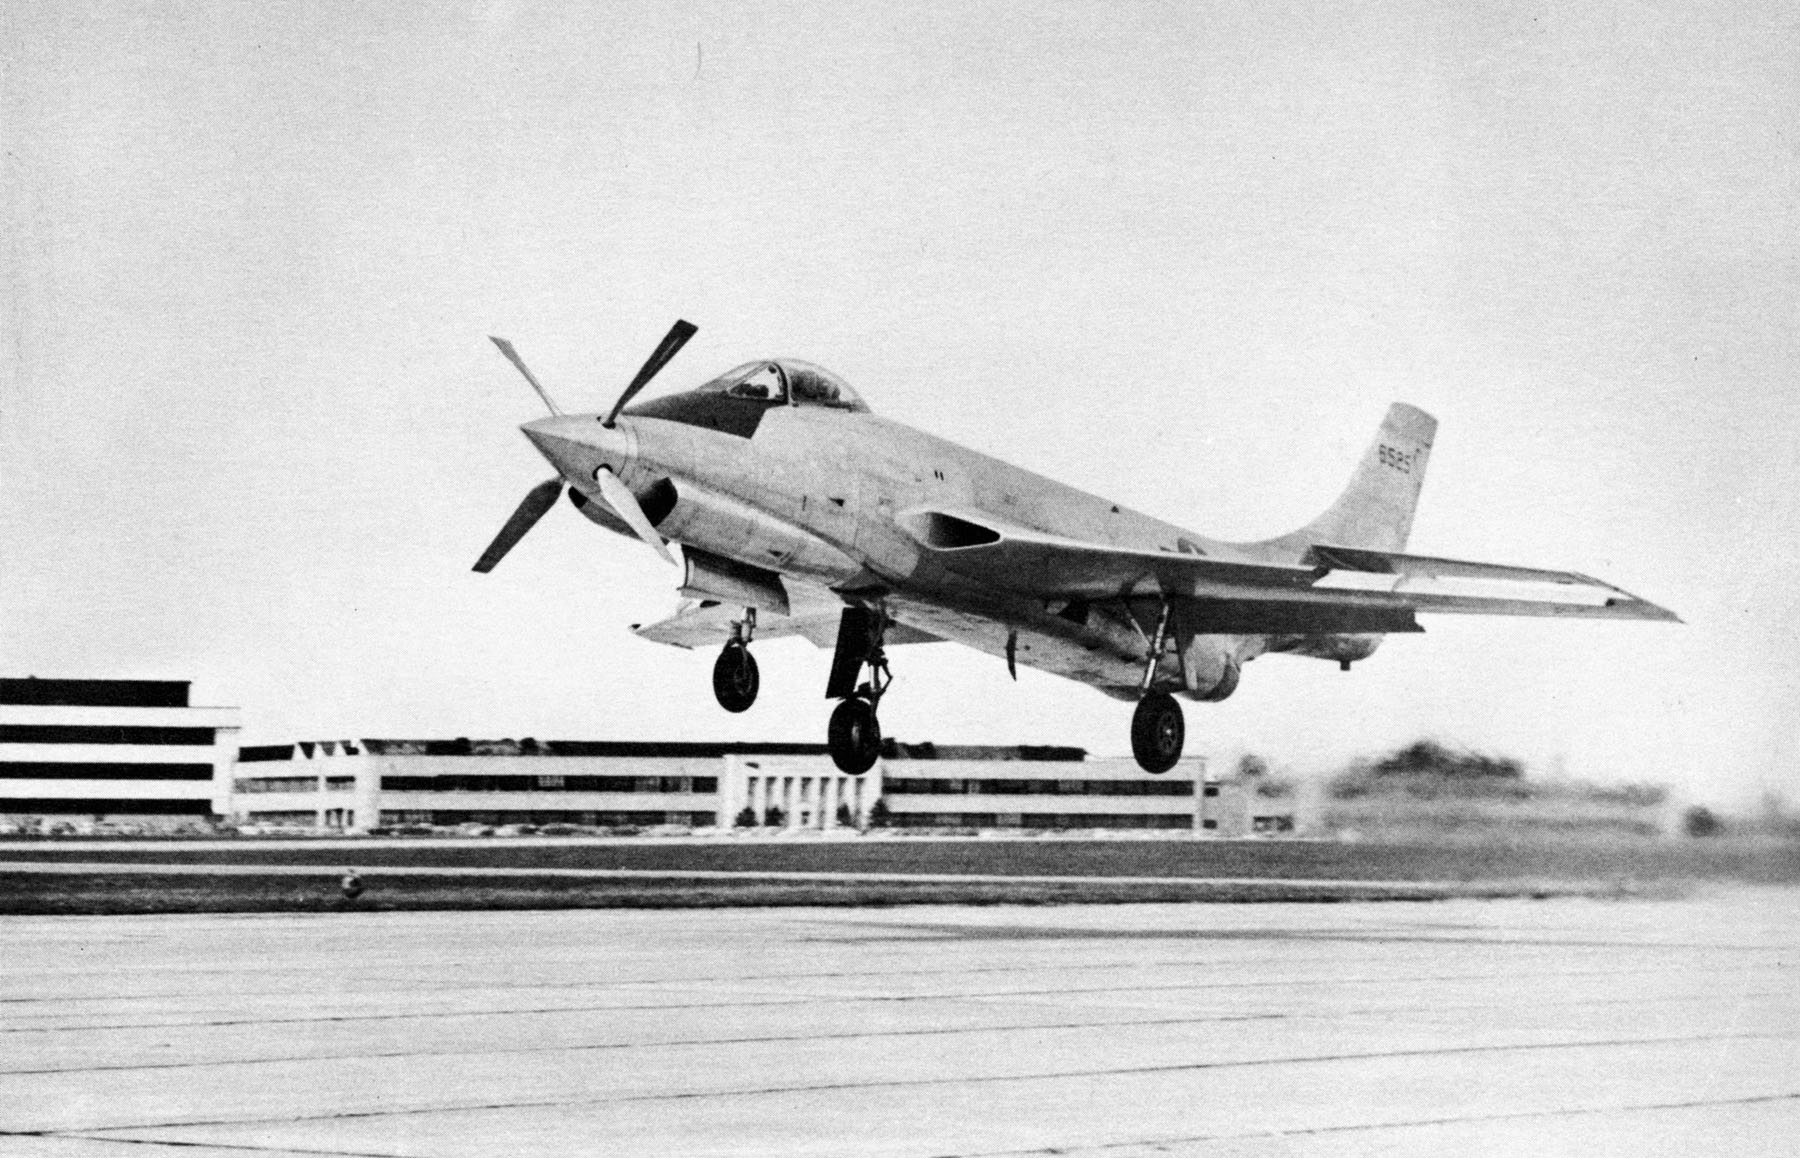 Le jet record qui hante encore un pays McDonnell_XF-88B_%28SN_46-525%29_turboprop_landing_060728-F-1234S-038